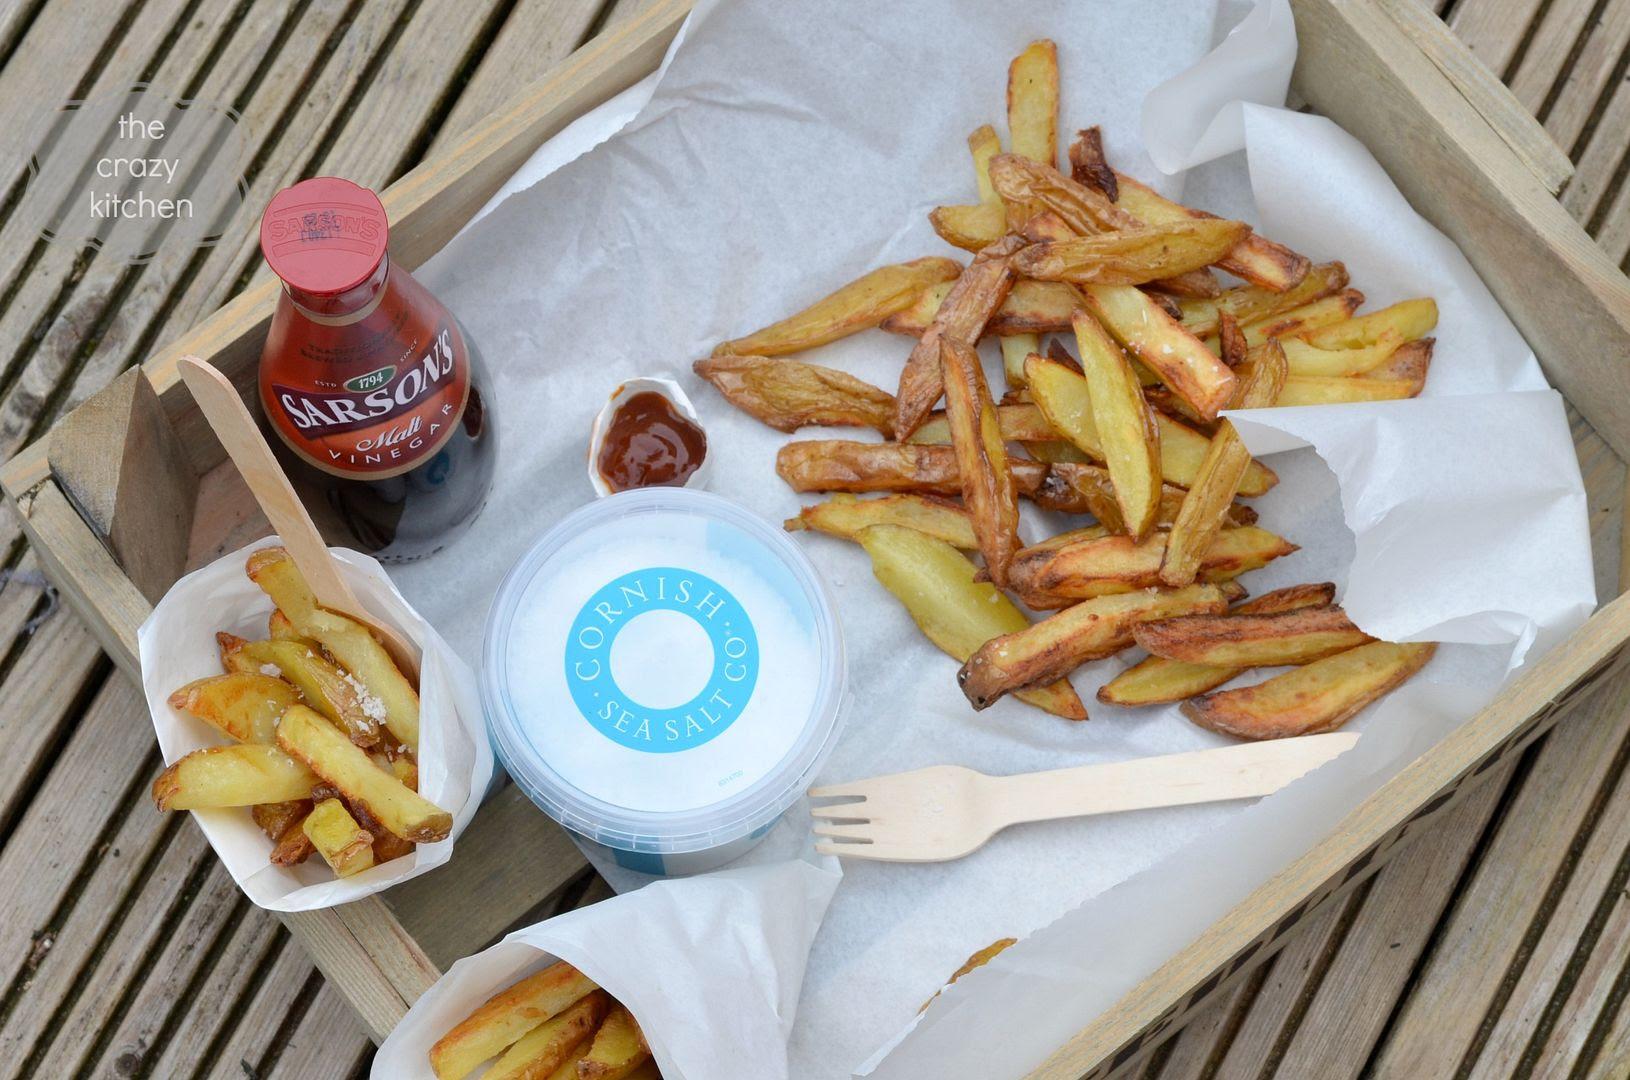 chips in a tray photo chipstray_zpsbb81b9f4.jpg